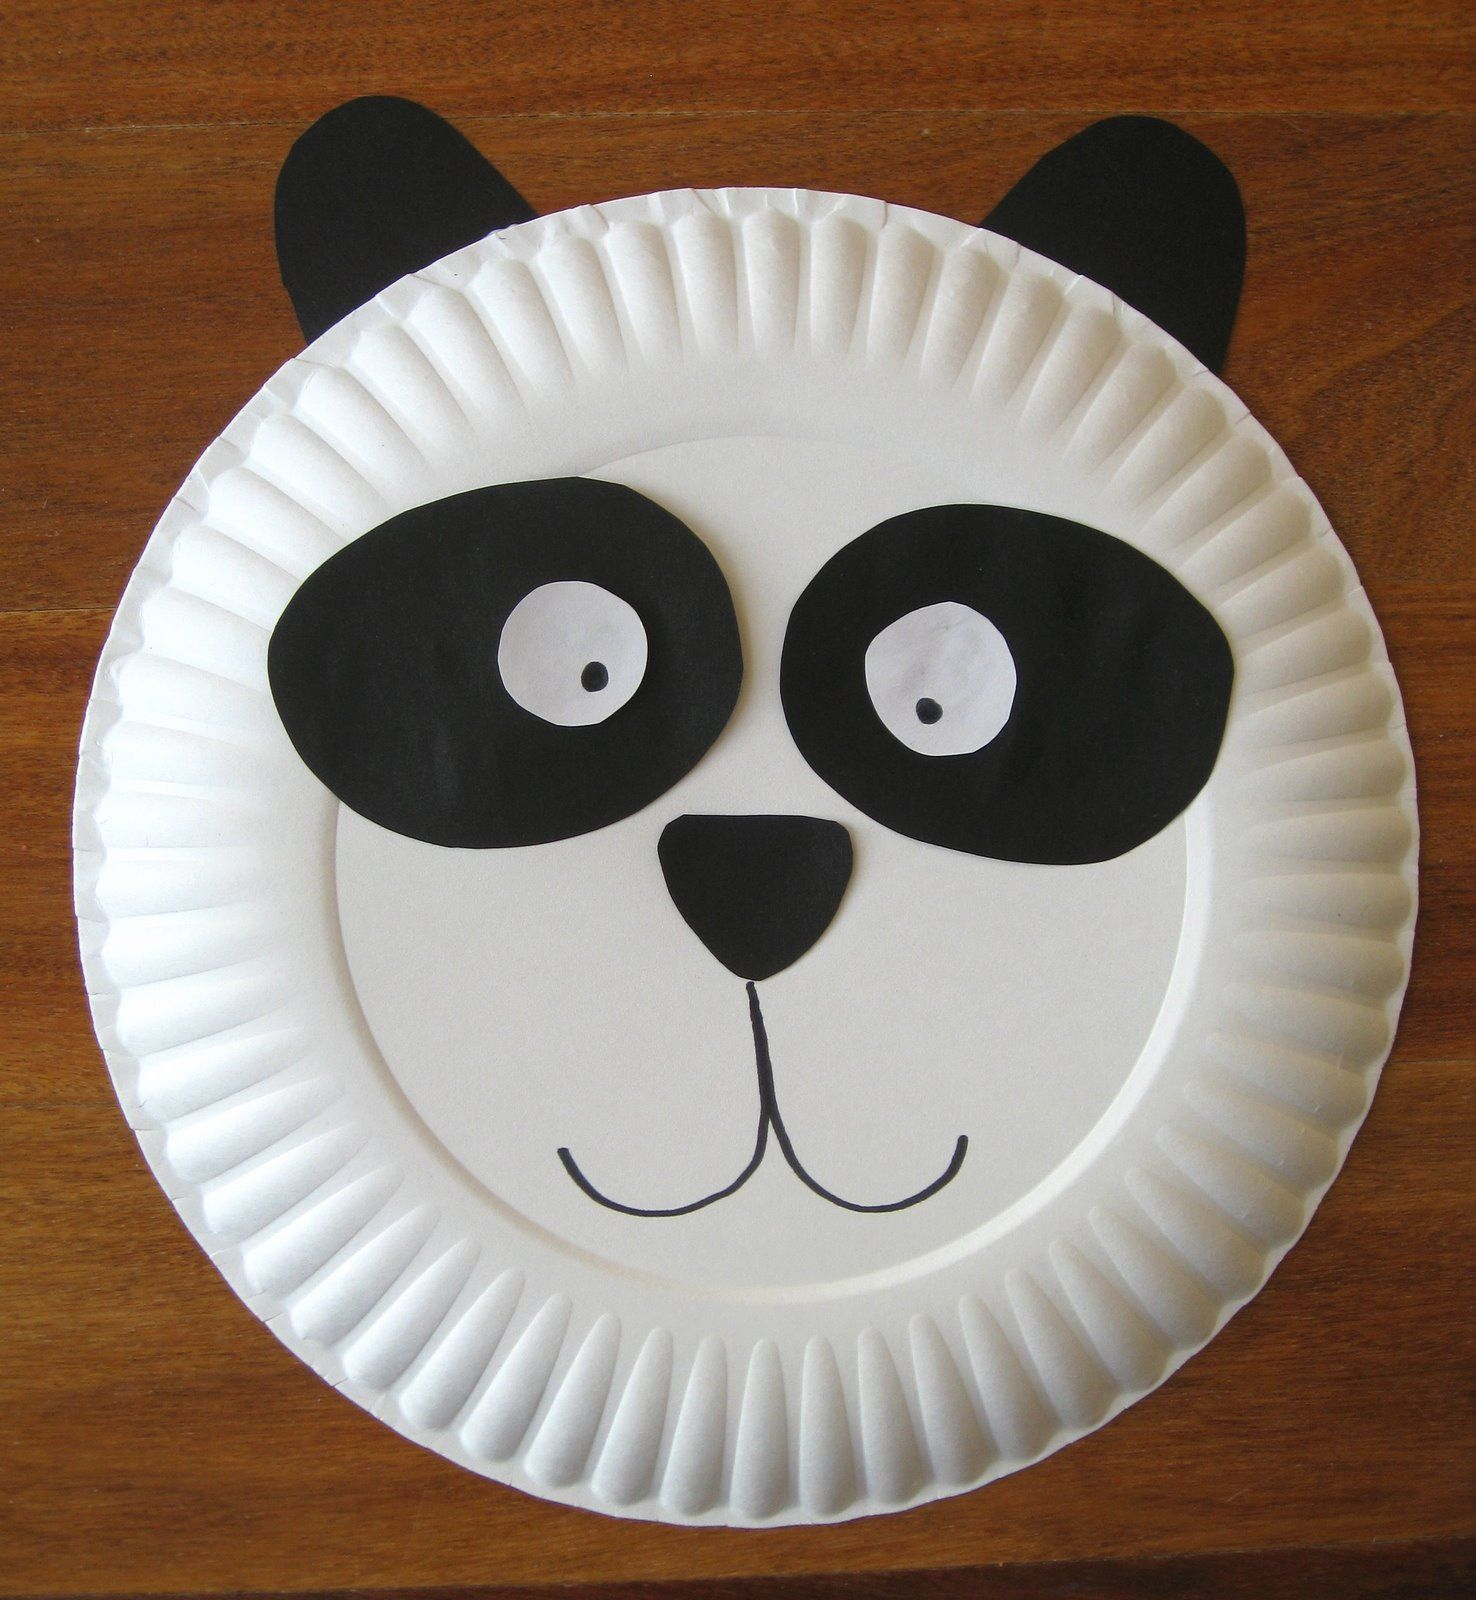 Paper plate animal crafts - Panda Paper Plate Craft Cindy Derosier My Creative Life Paper Plate Panda